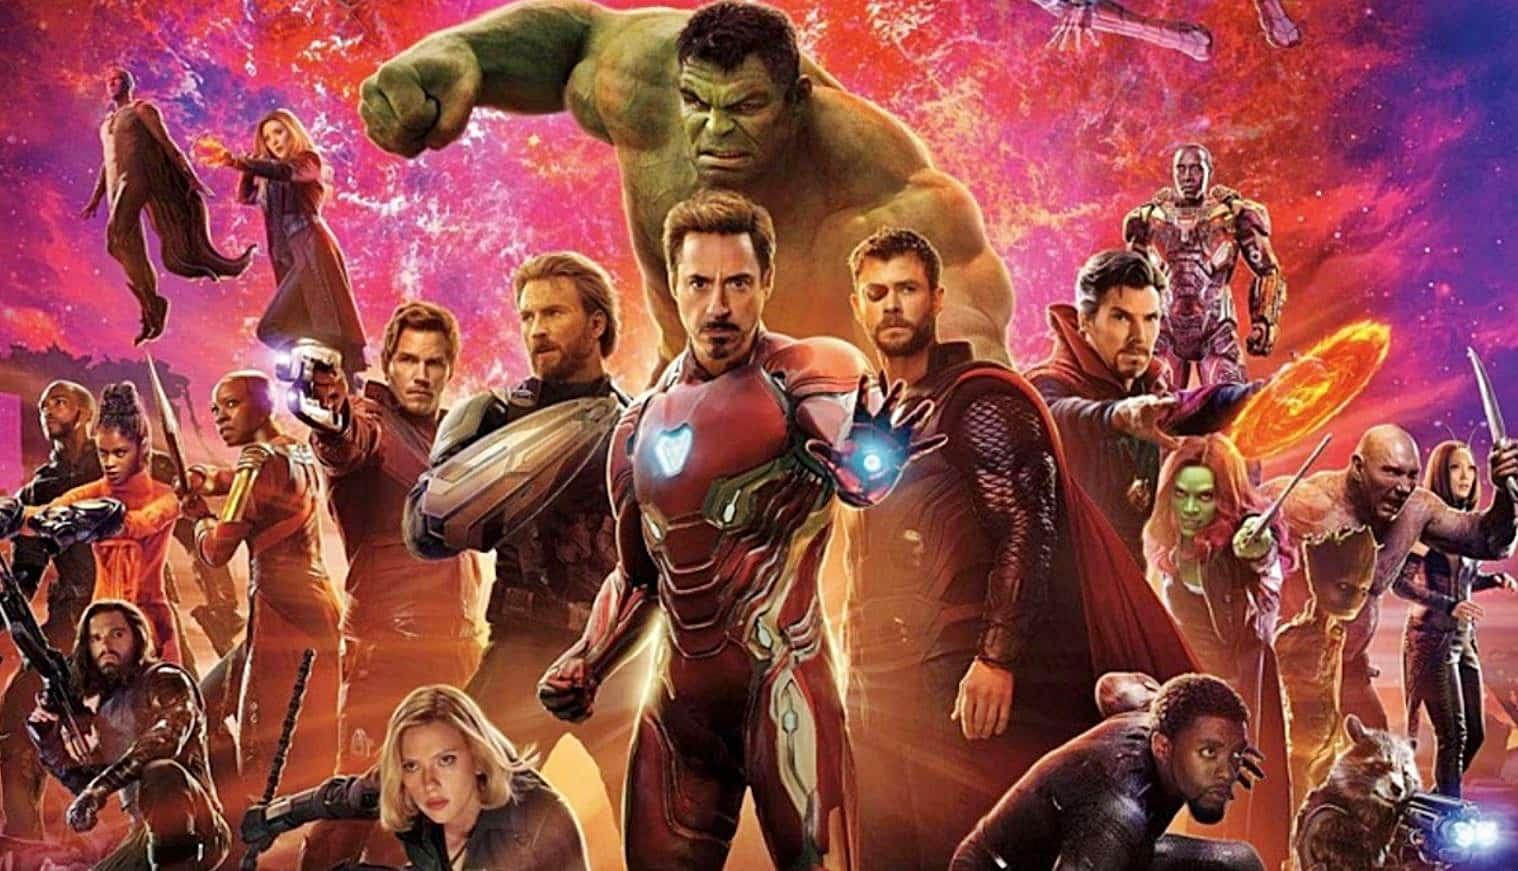 Avengers 4 Release